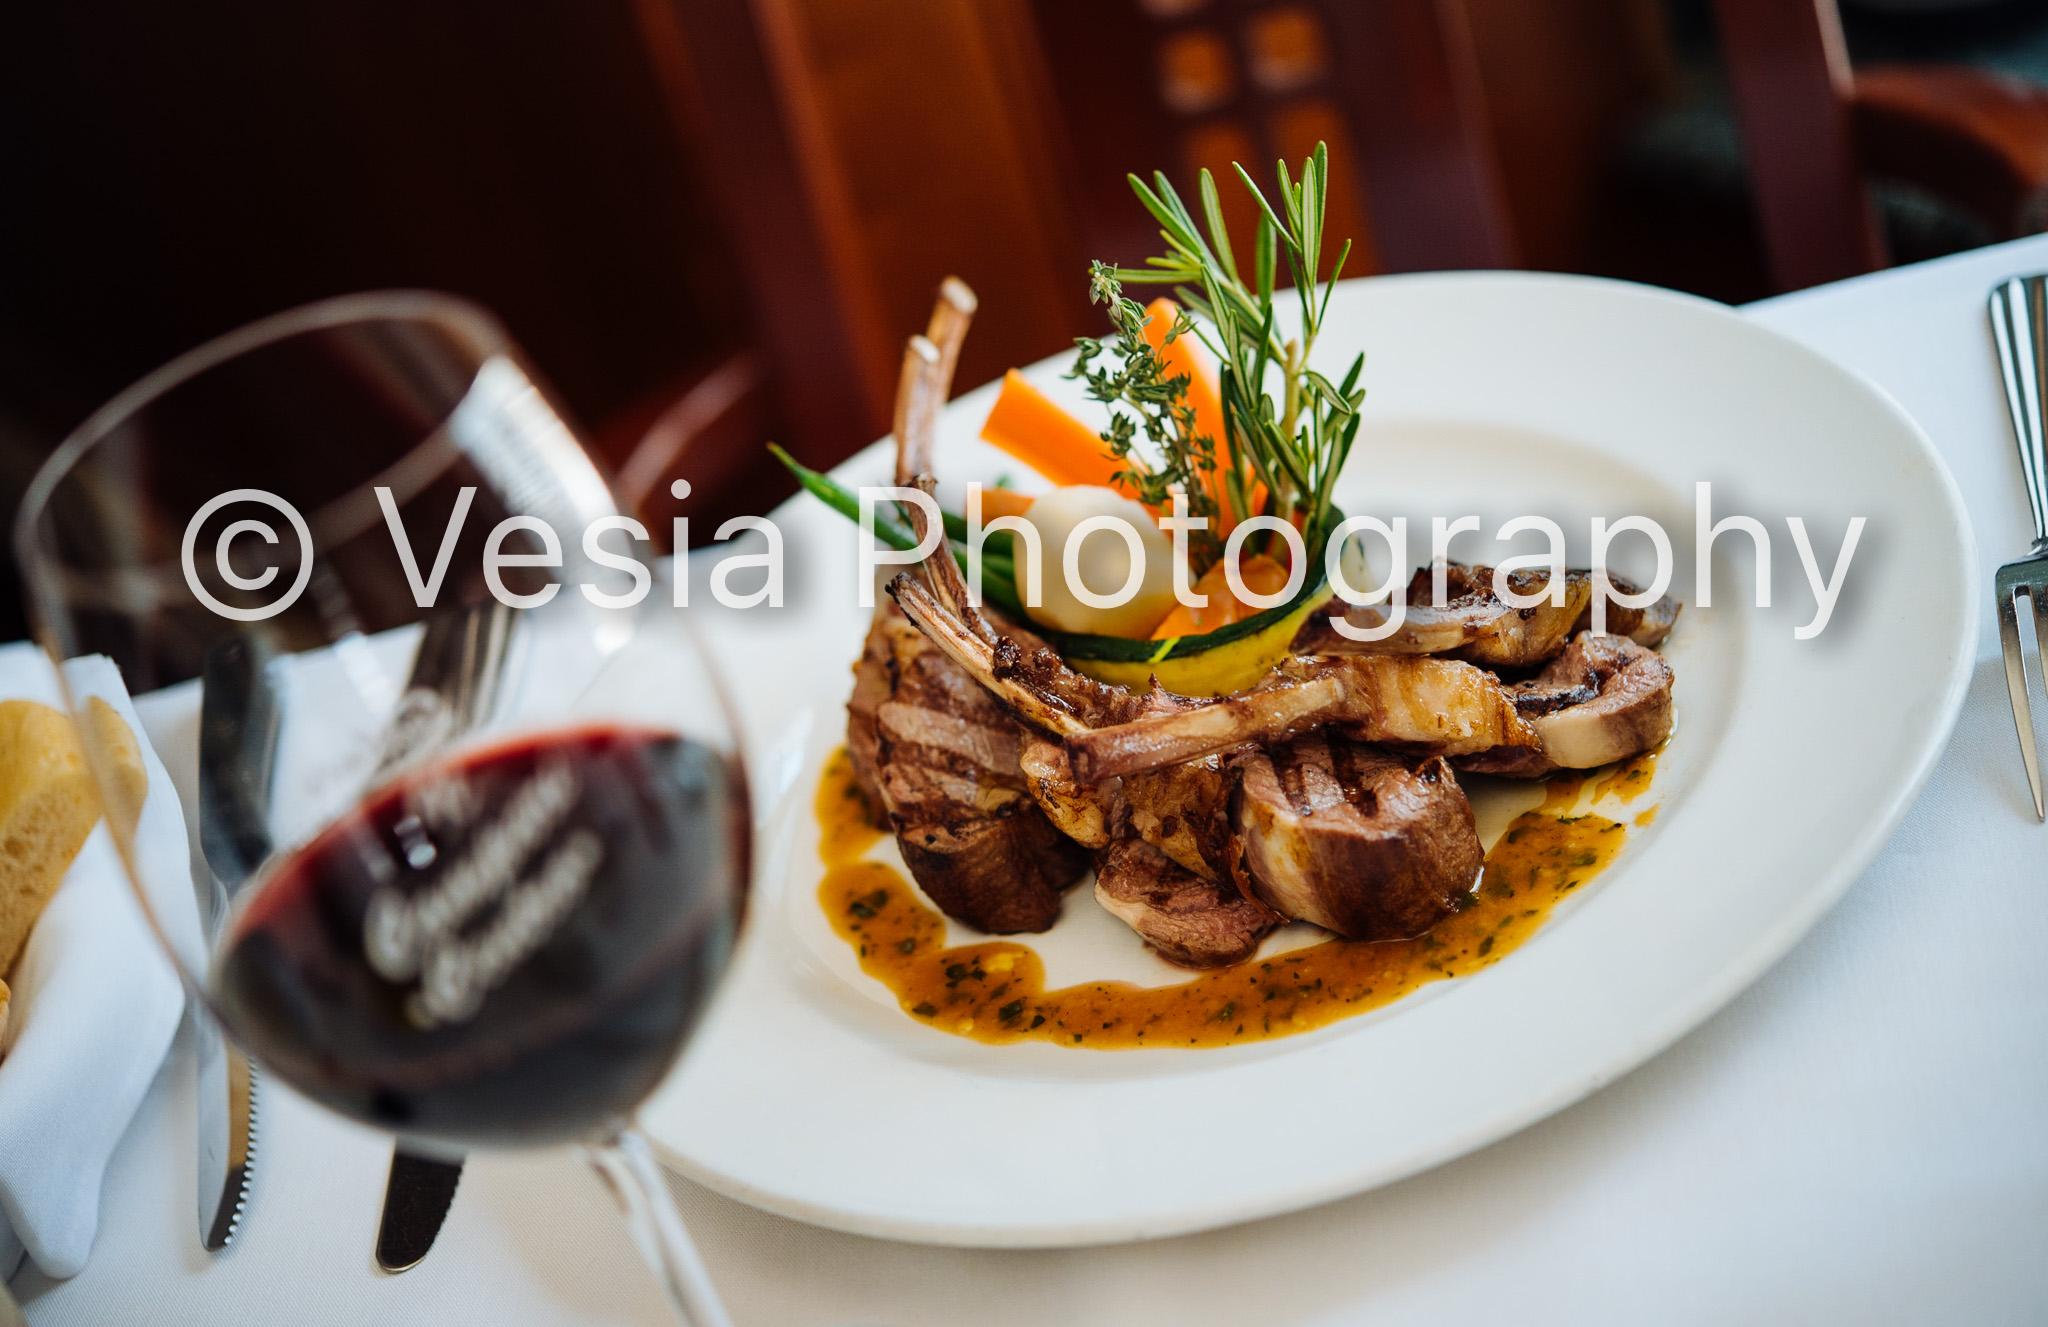 Campari_Centro_Food_Proofs-31.jpg